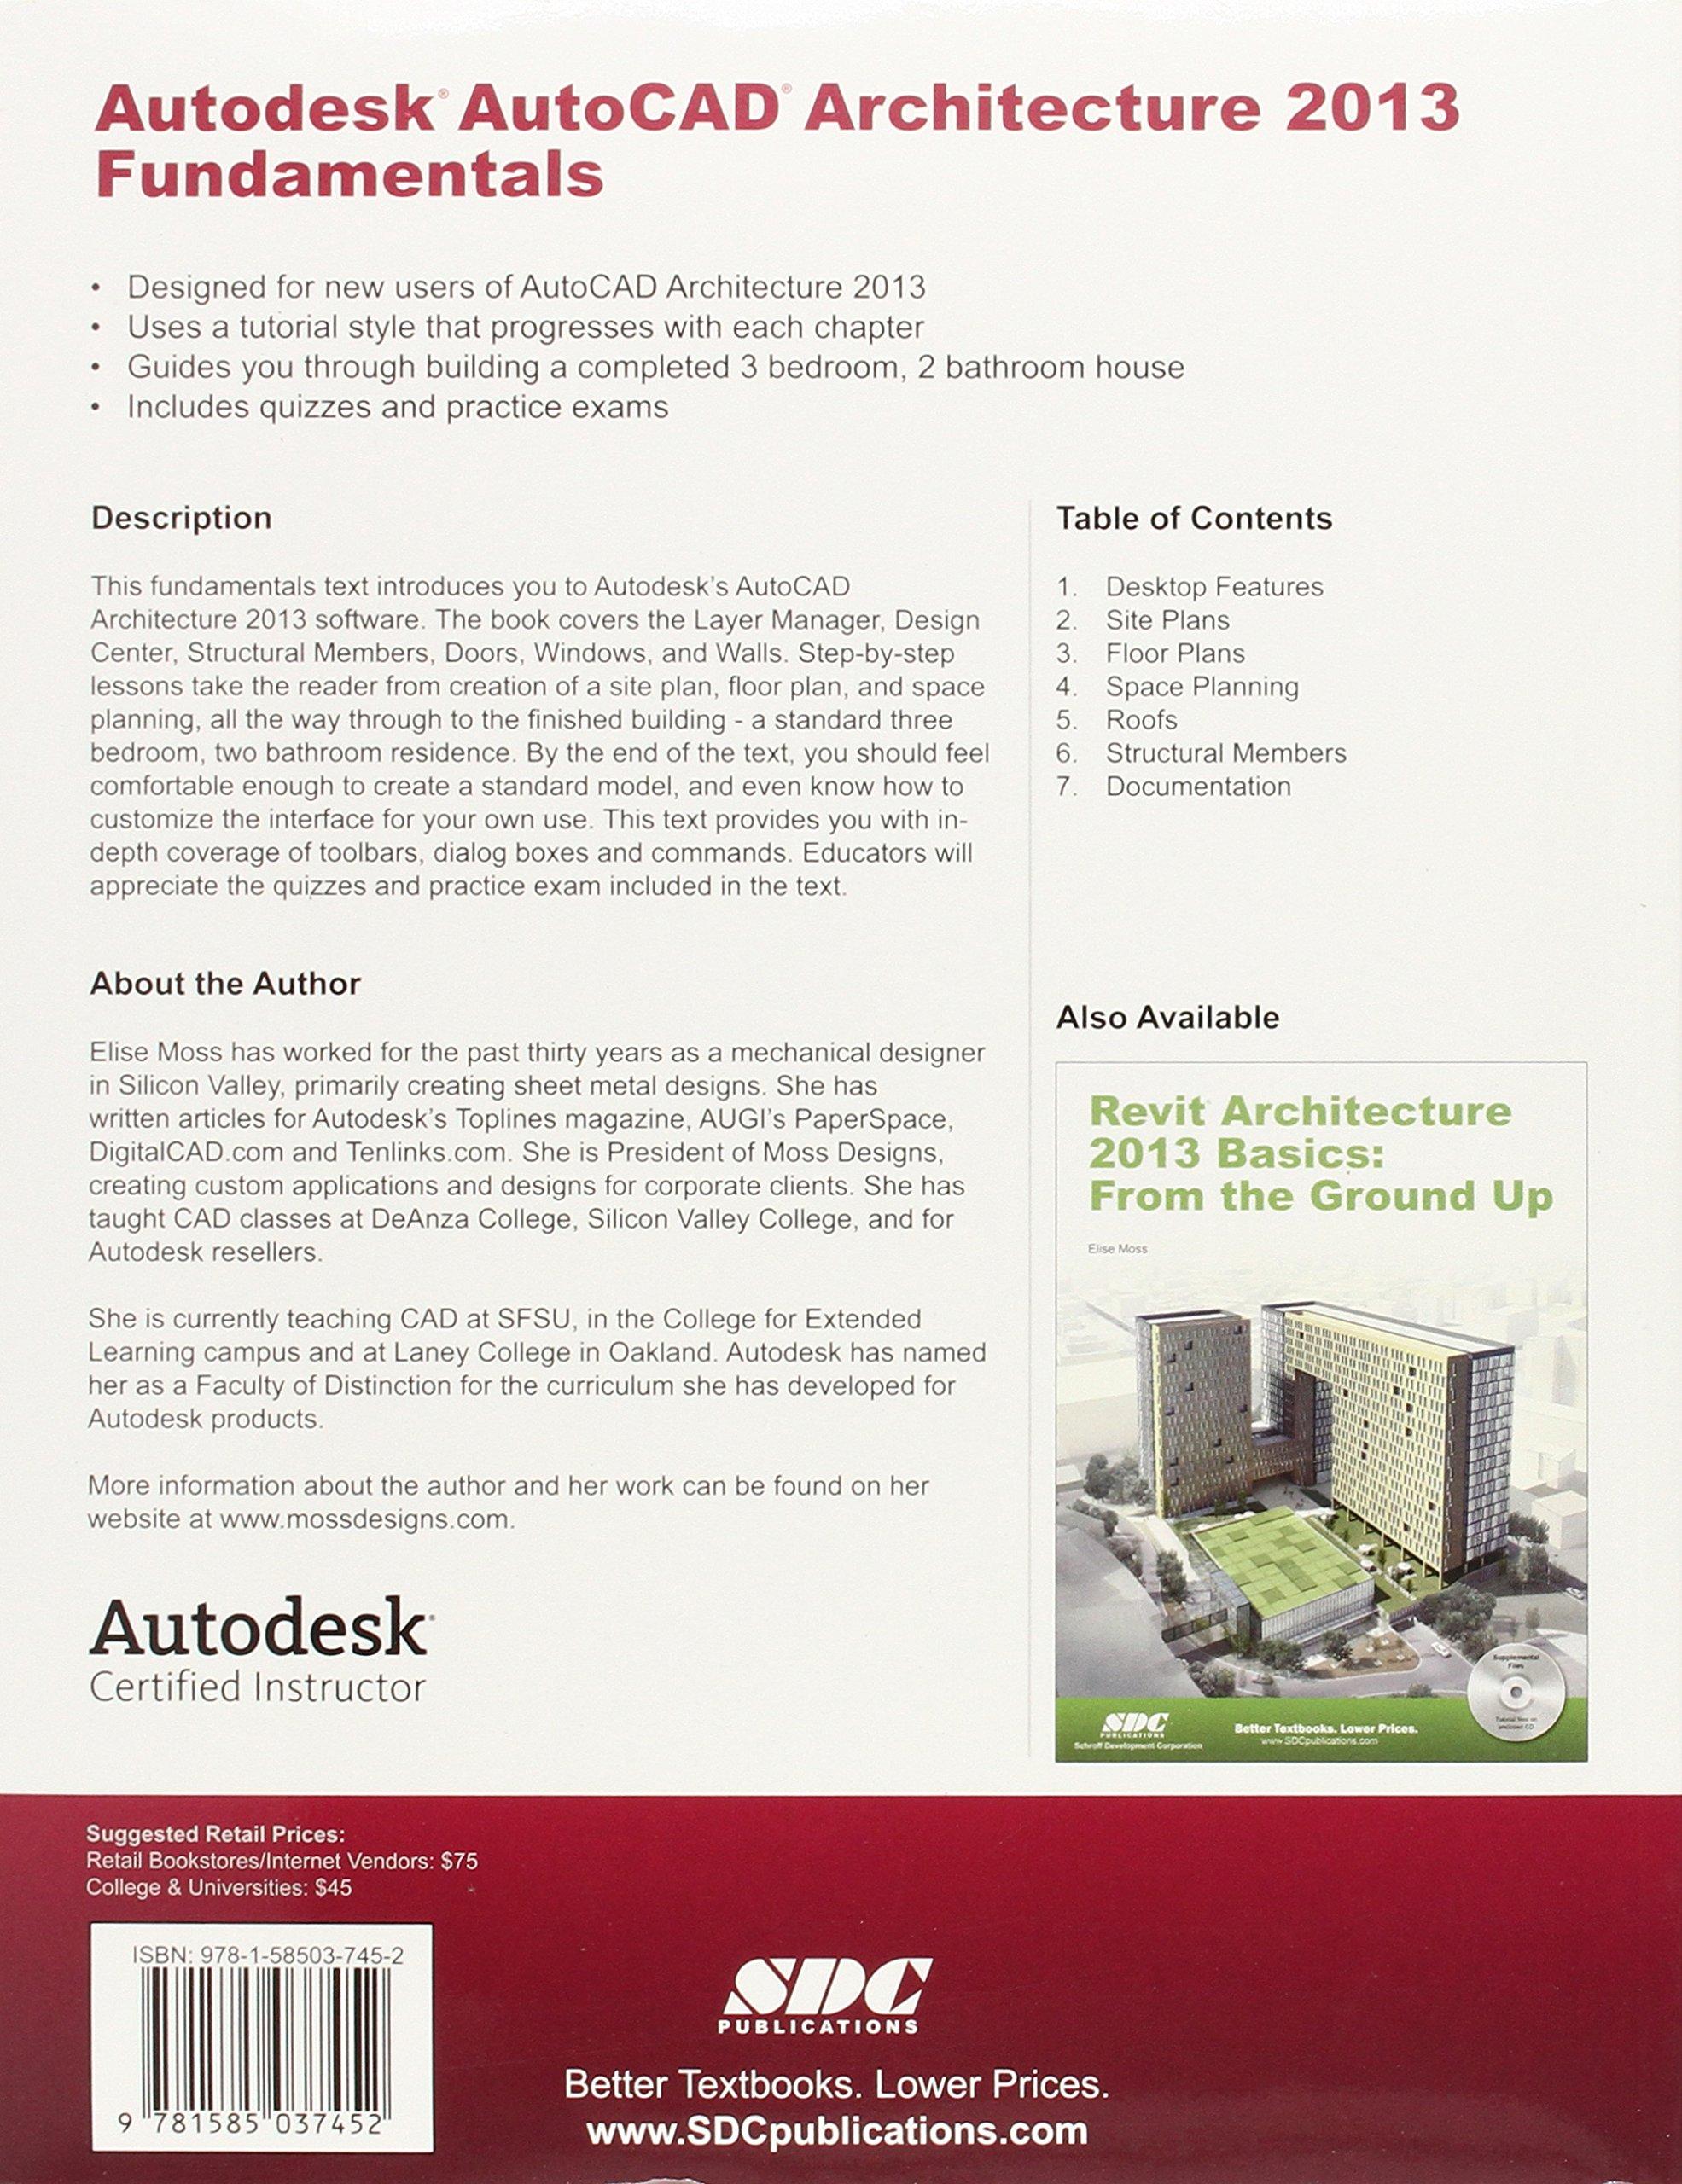 AutoCAD Architecture 2013 price